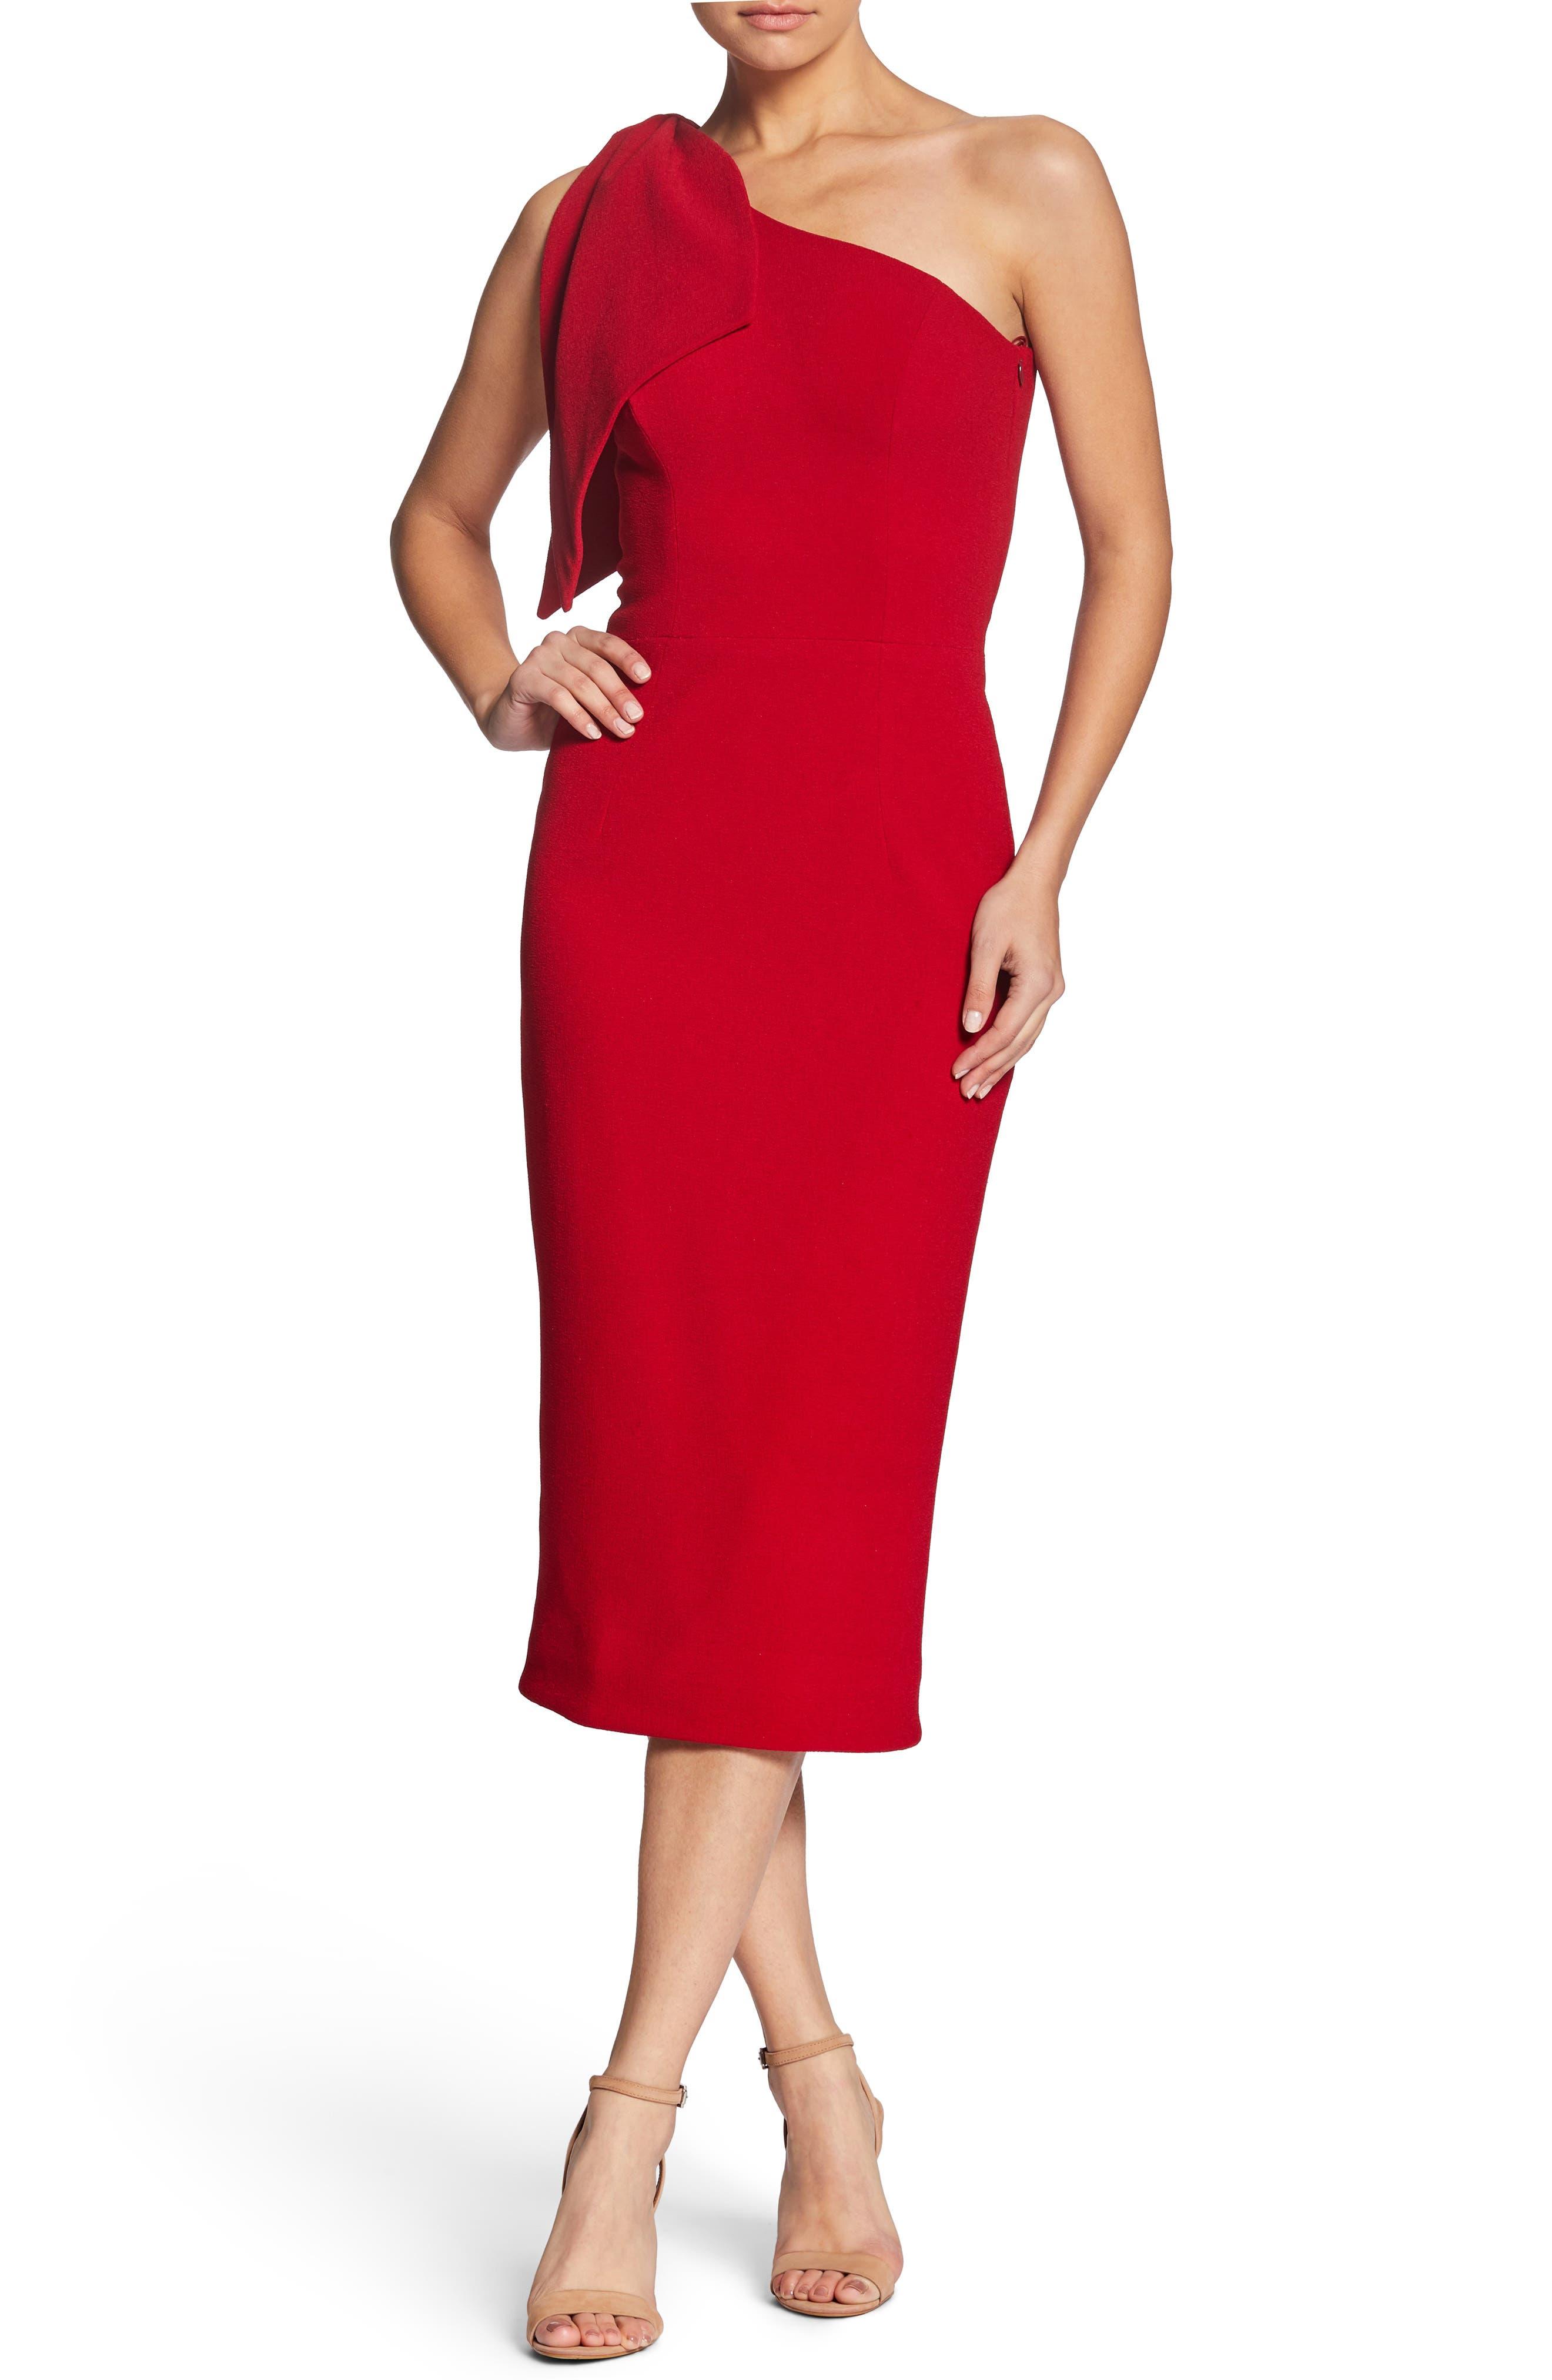 Tiffany One-Shoulder Midi Dress,                             Main thumbnail 1, color,                             Garnet